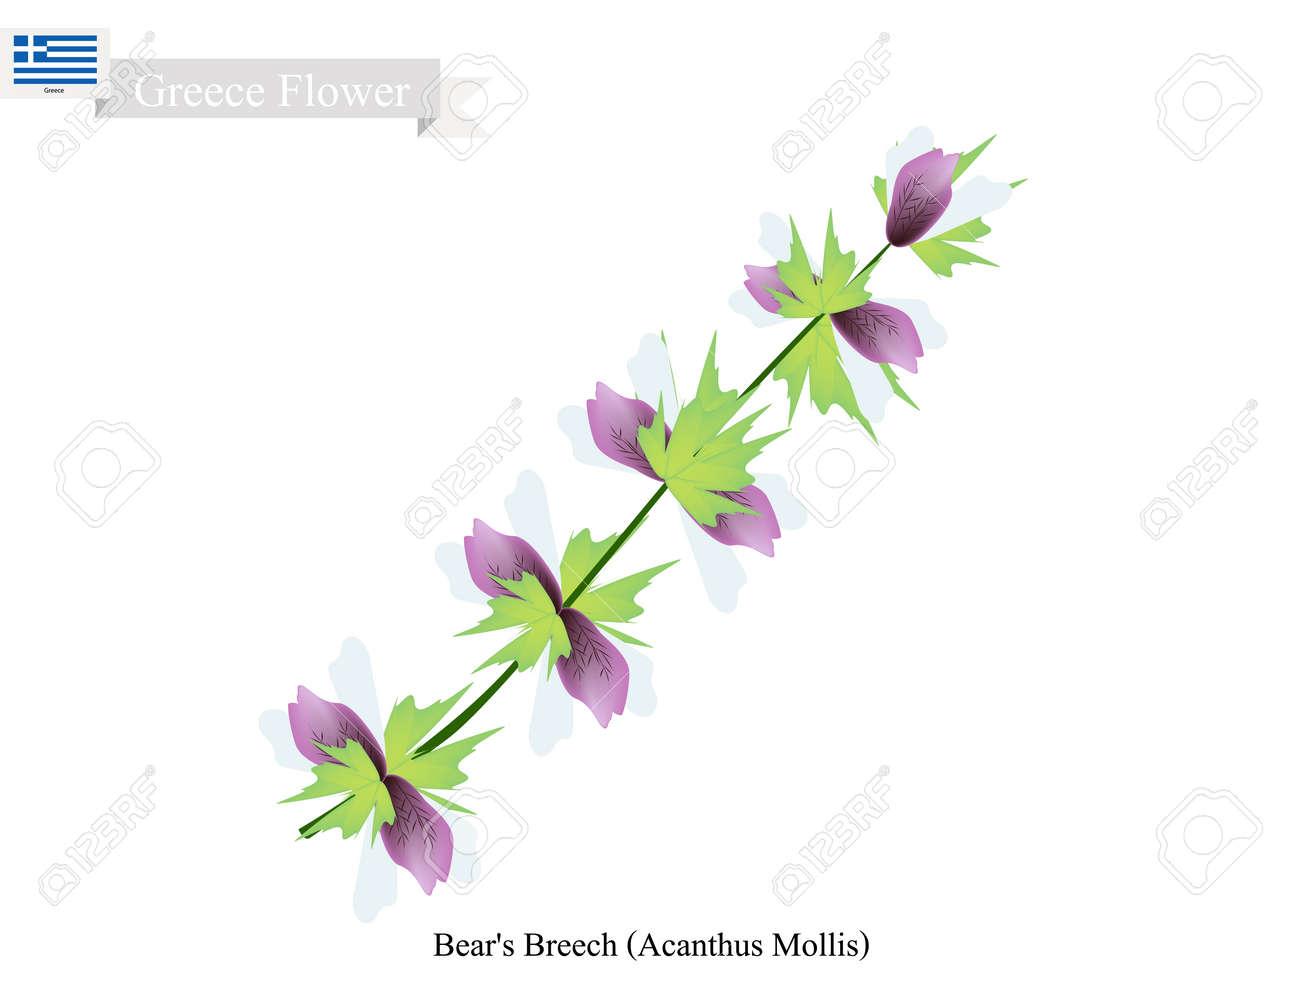 Greece Flower Illustration Of Bears Breech Or Acanthus Mollis